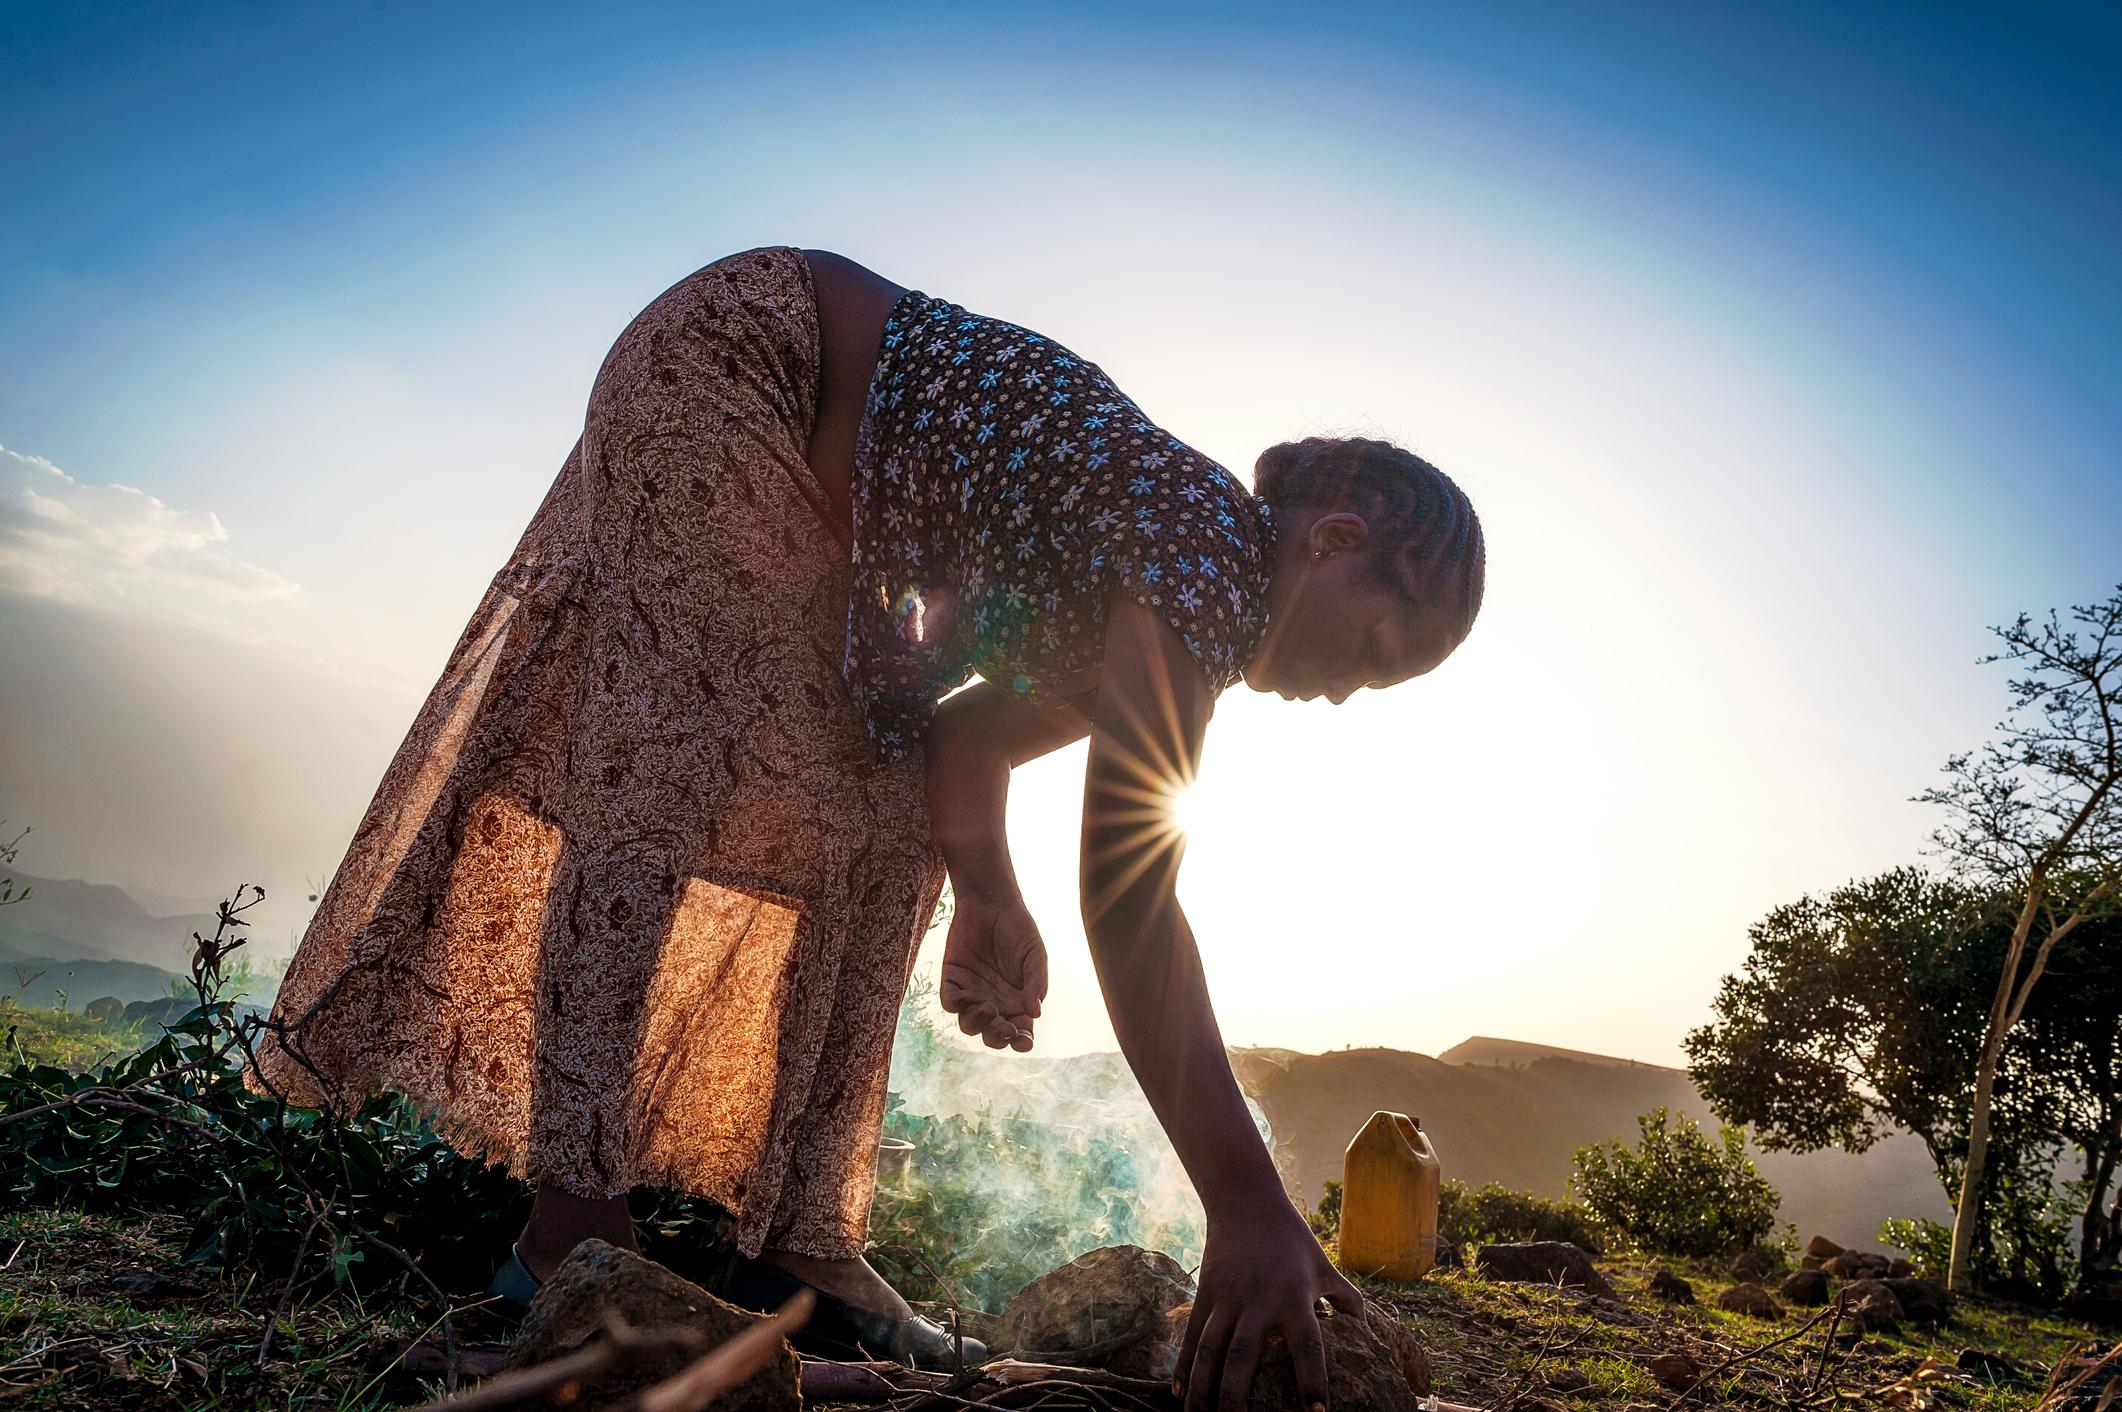 Emerging markets in Africa buckle under mountains of debt